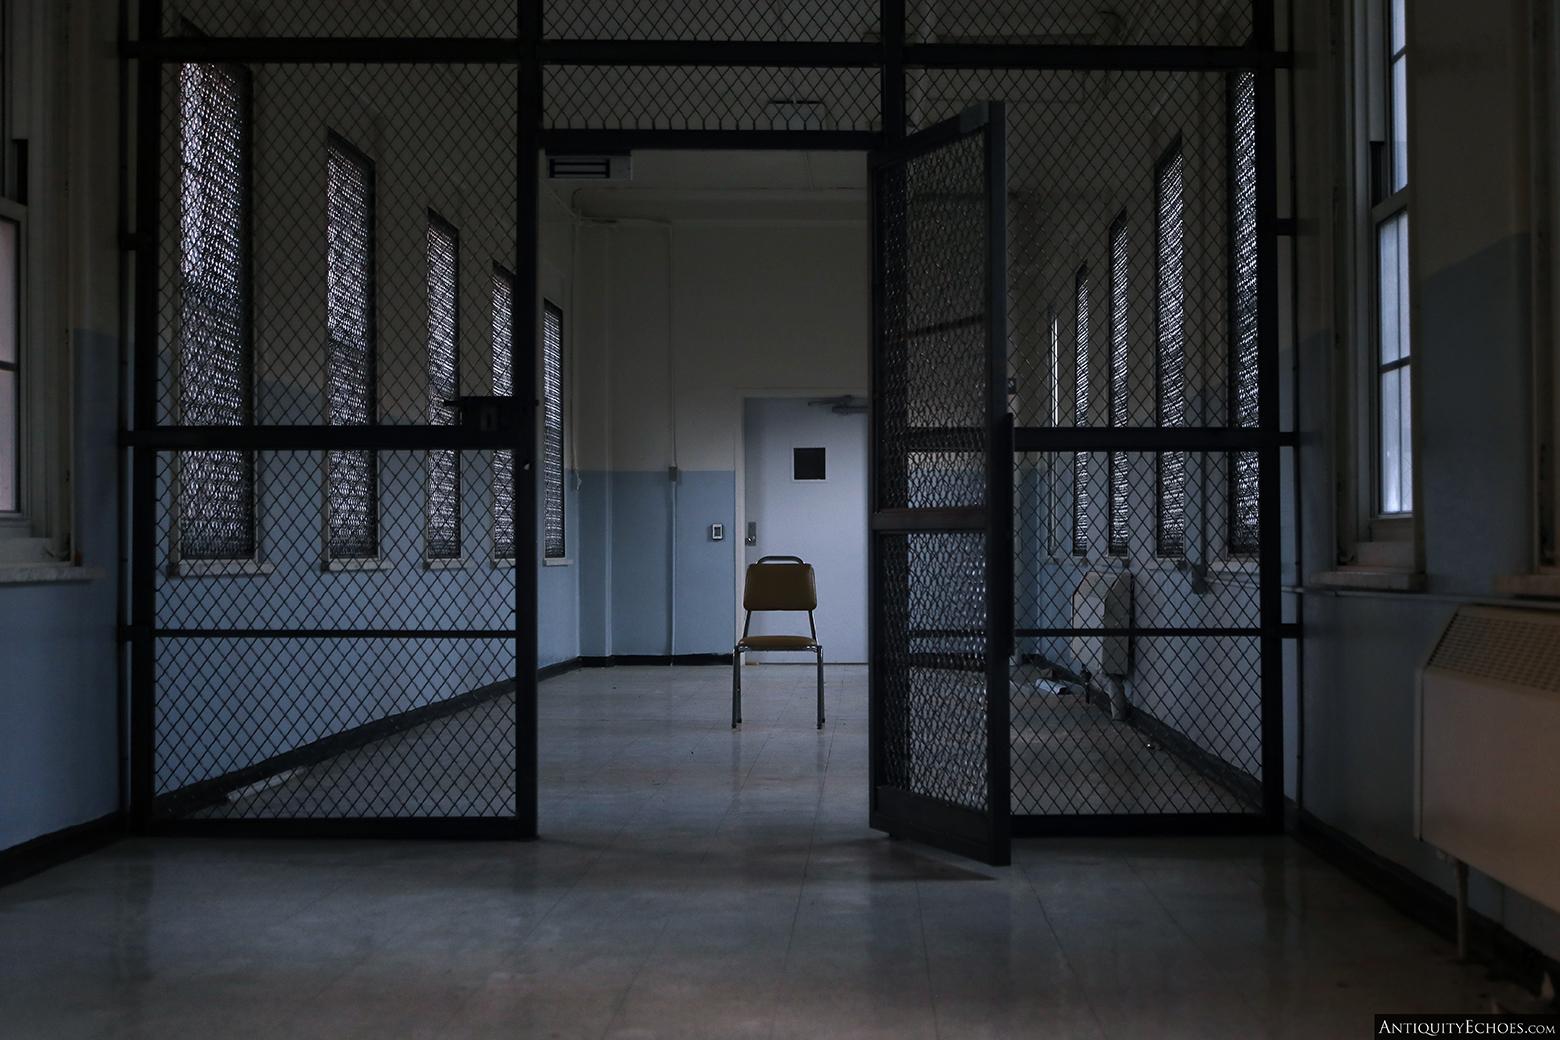 Allentown State Hospital - Caged Hallway